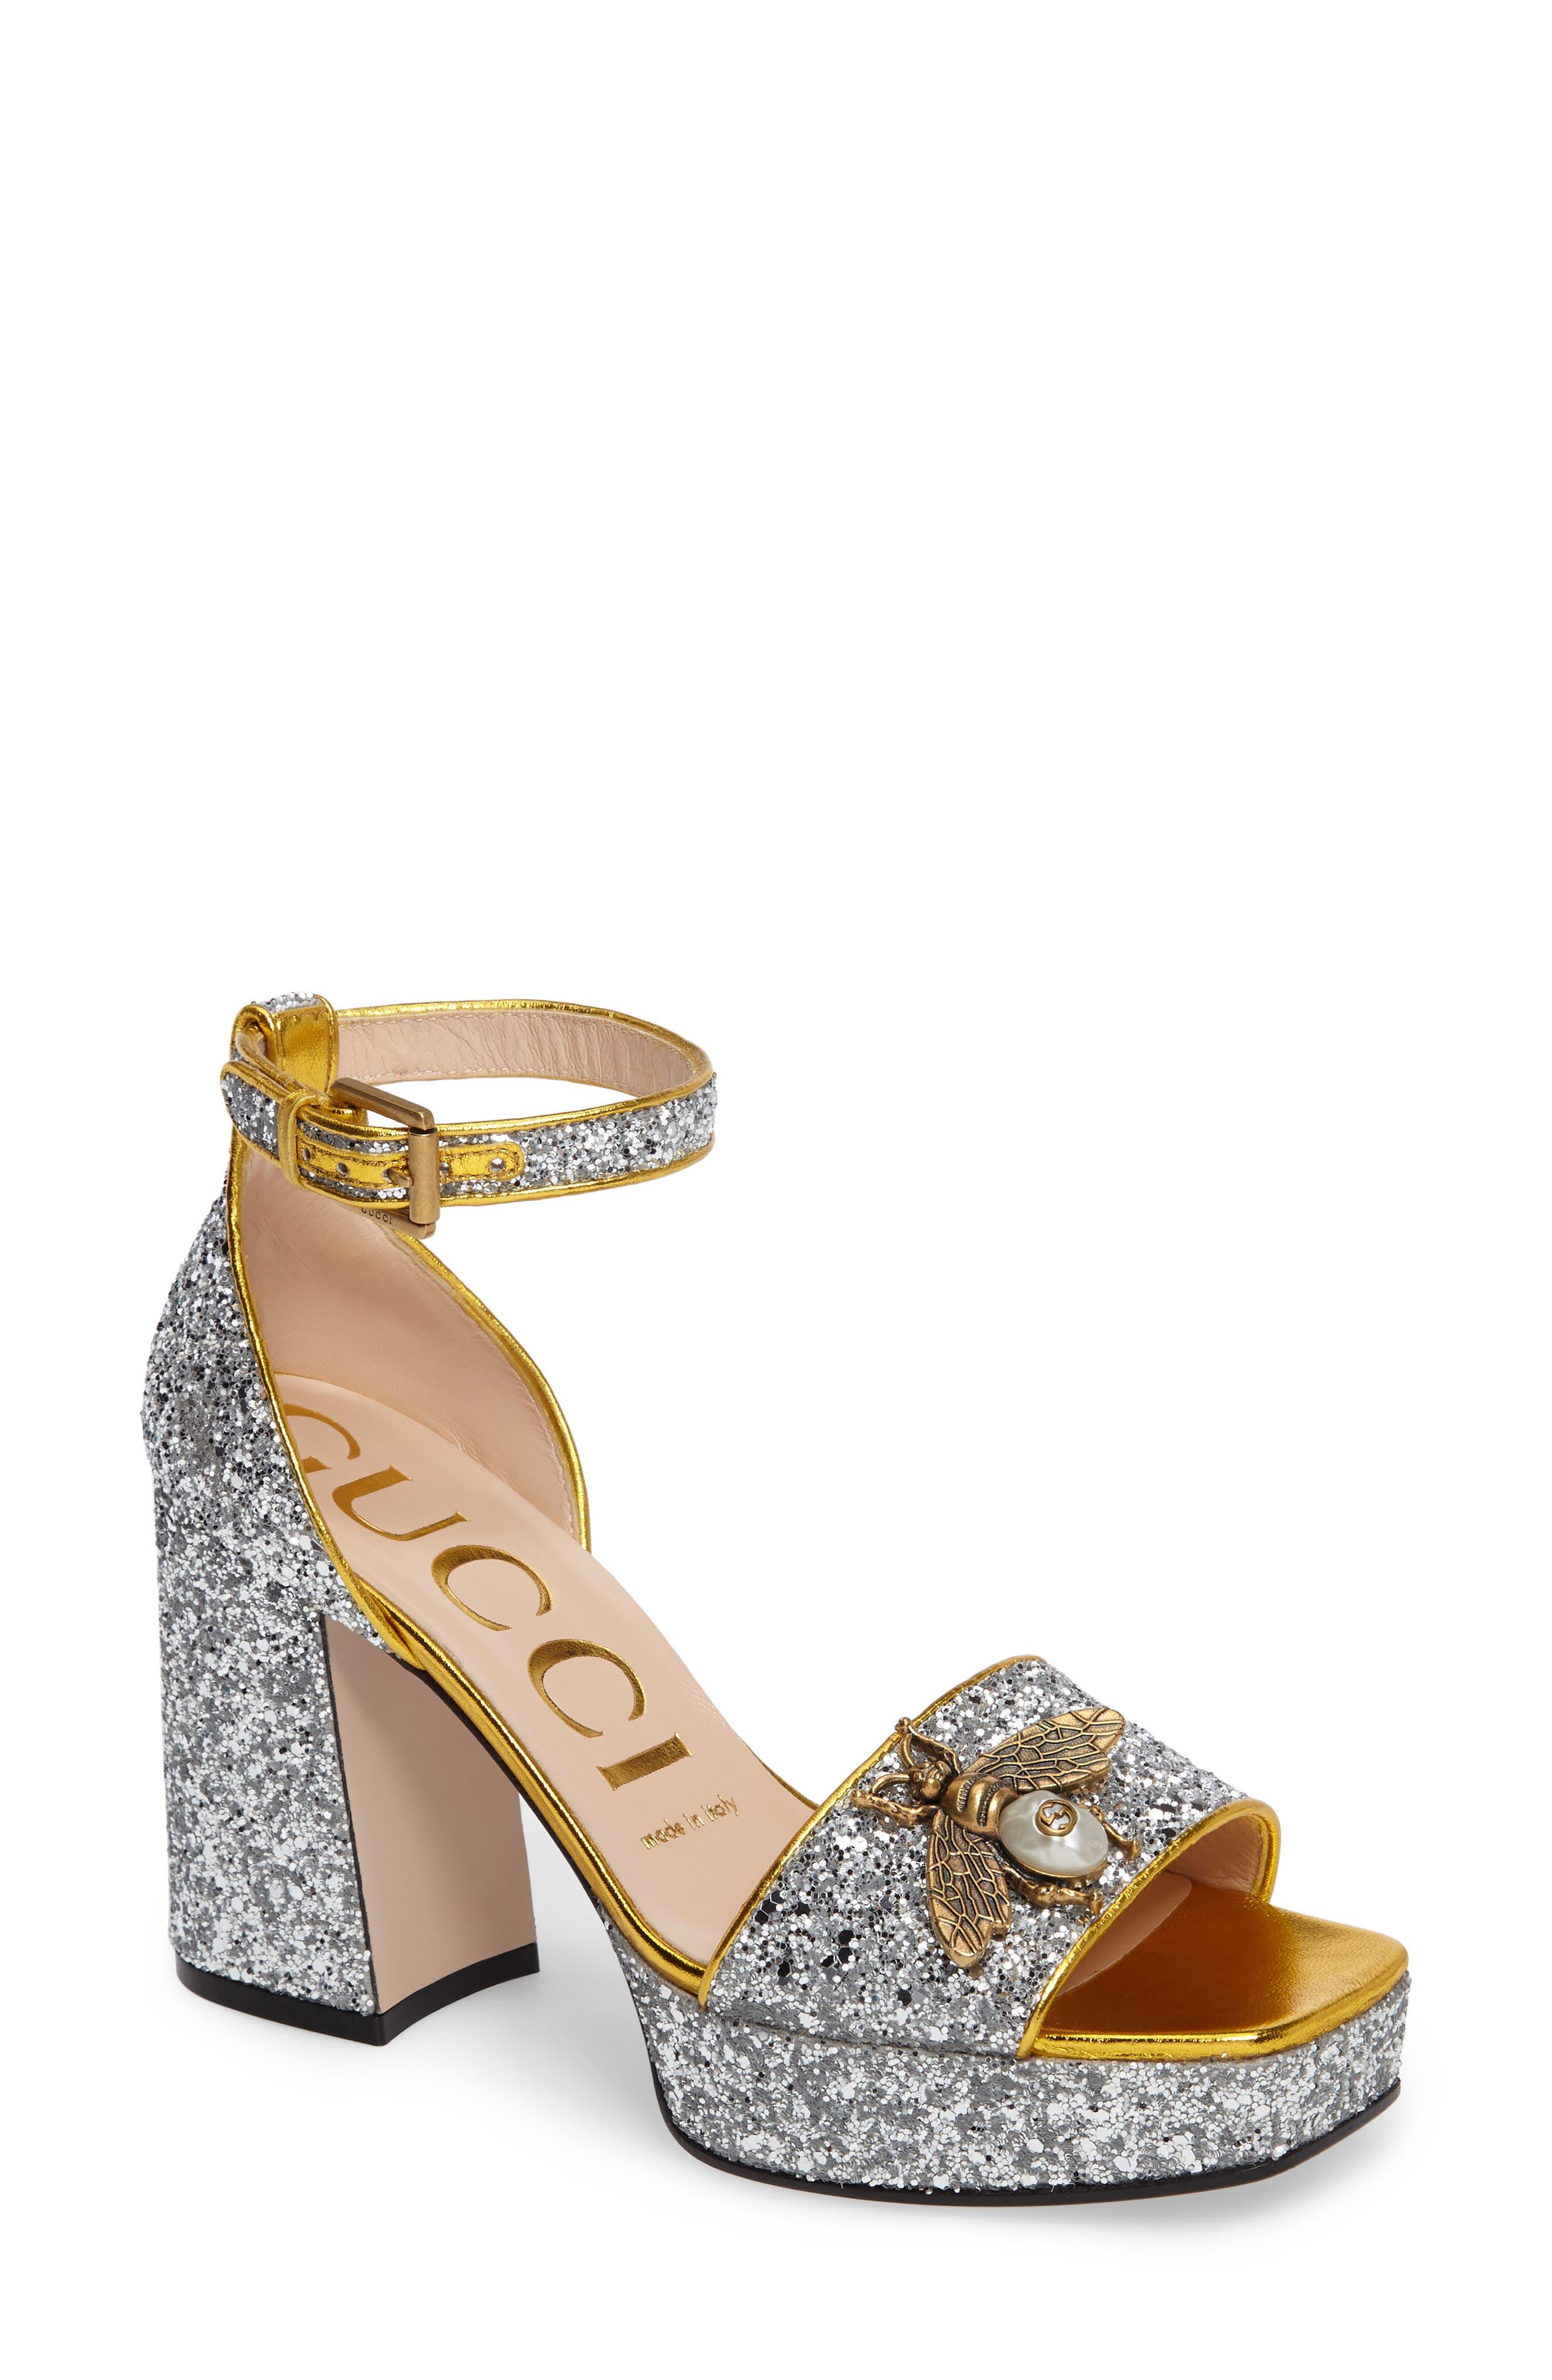 GUCCI,                             Soko Glitter Bee Sandal,                             Main thumbnail 1, color,                             040